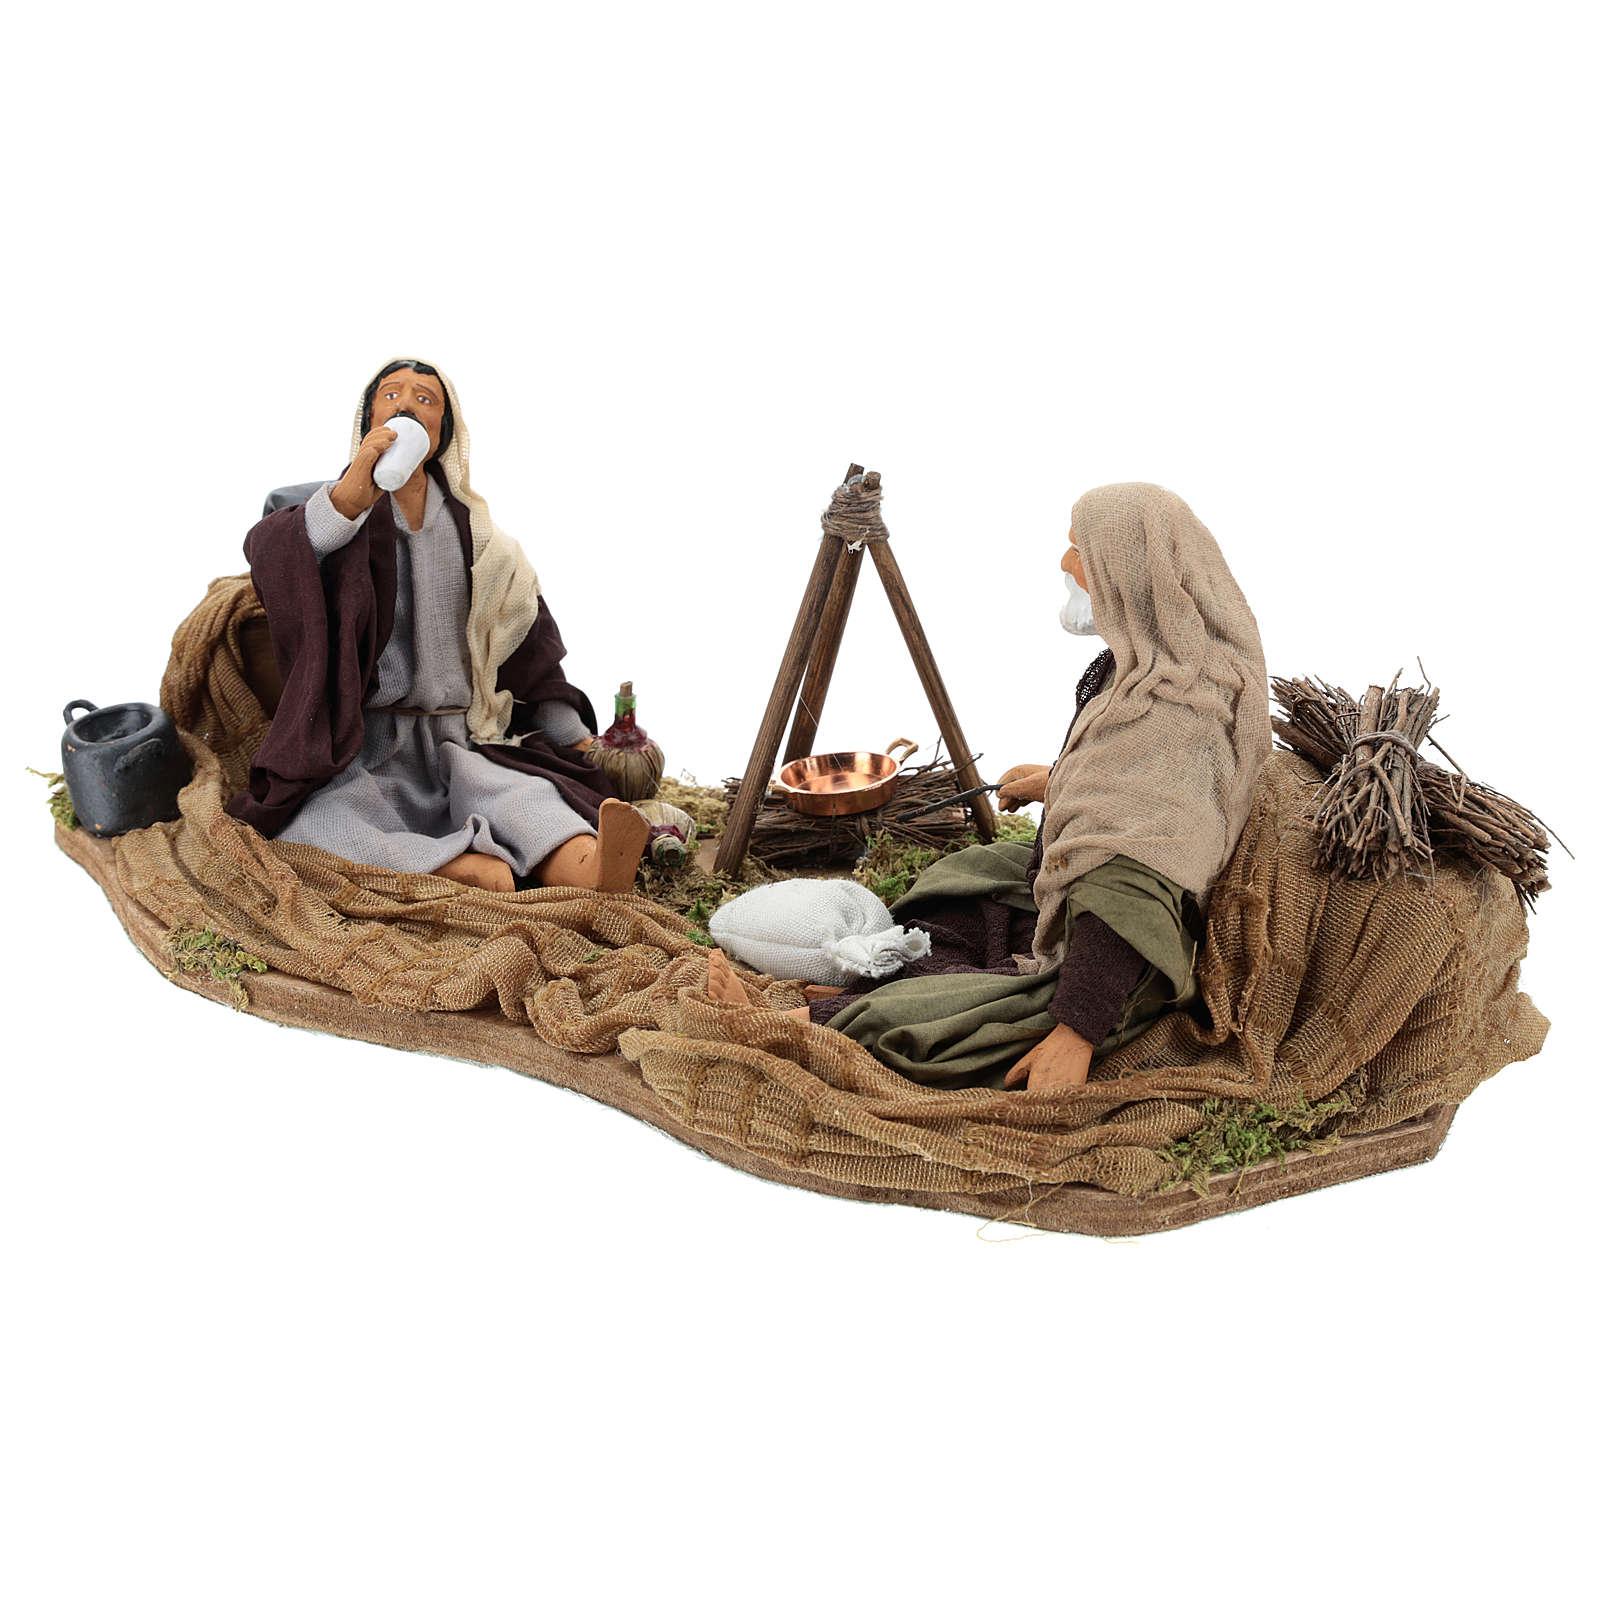 Camping scene, animated Neapolitan Nativity figurine 14cm 4